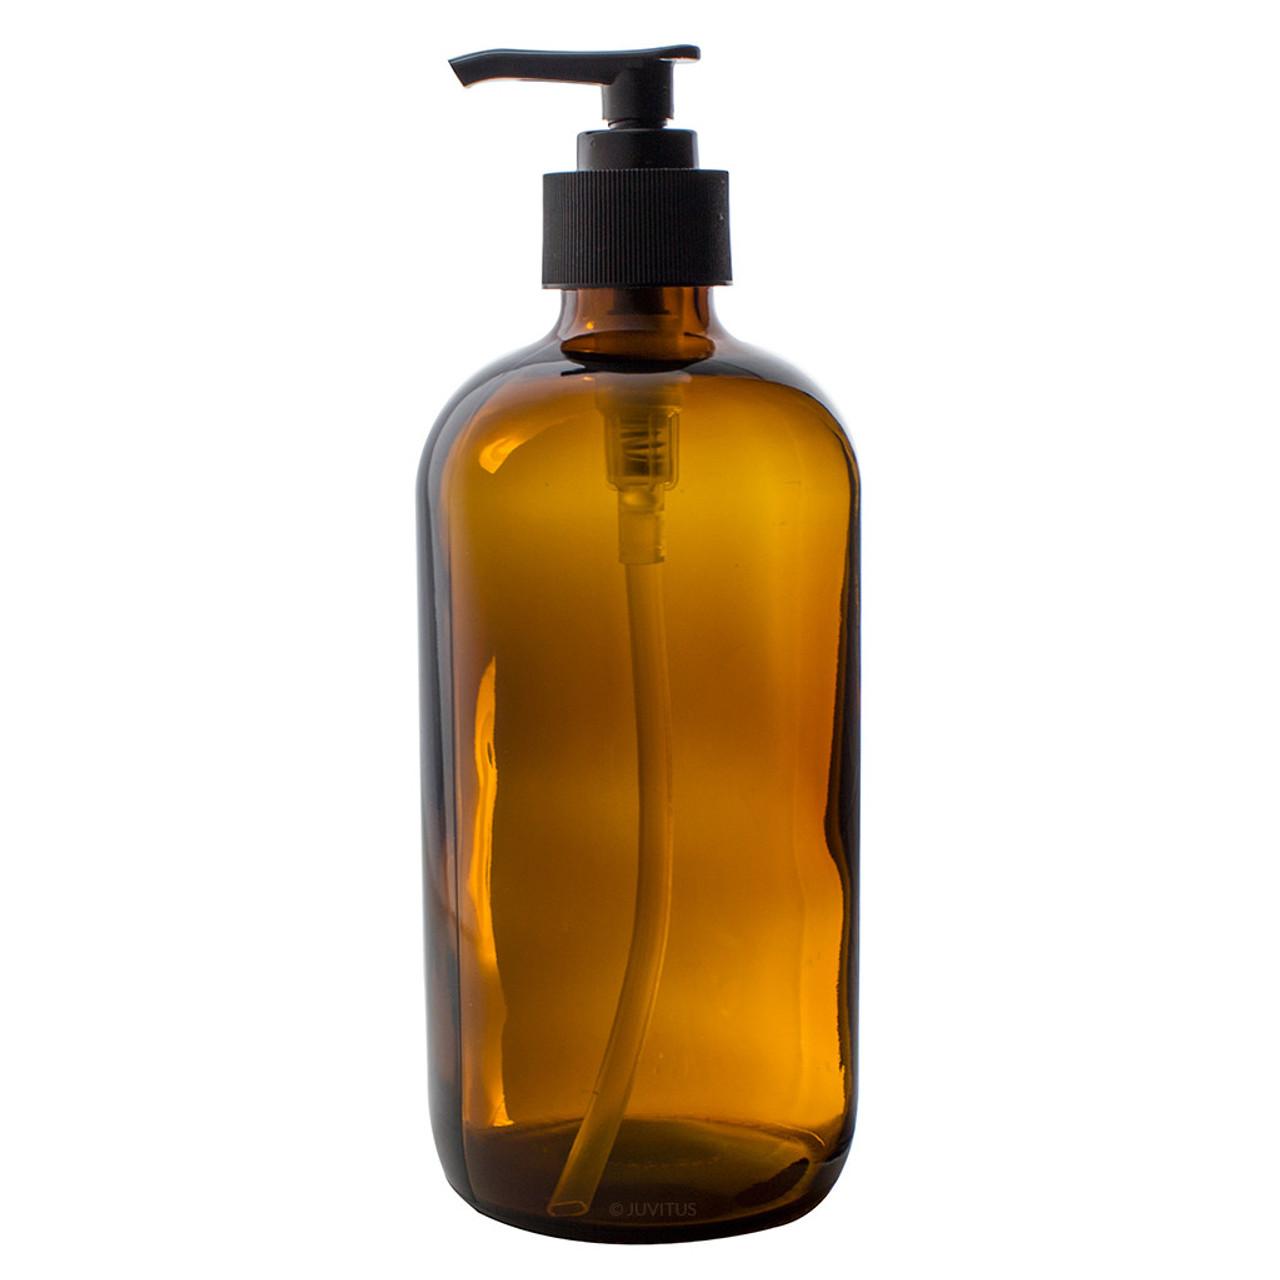 adbf81fea66f 32 oz AMBER Glass Bottle - w/ Lotion Pump - pack of 12